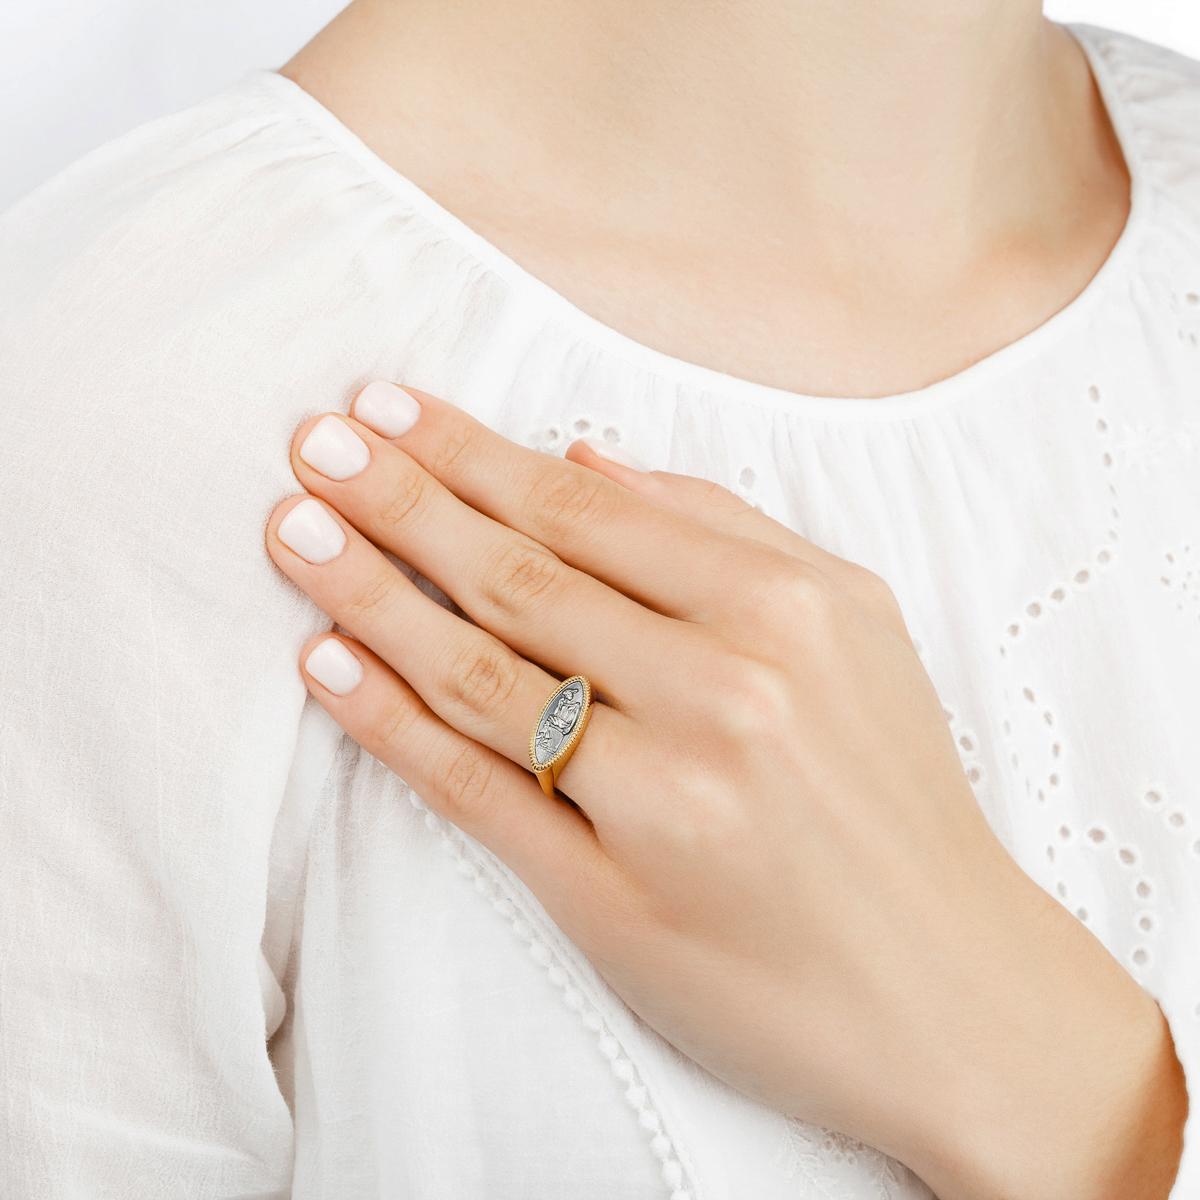 penelopa 1 - Кольцо из серебра «Пенелопа»